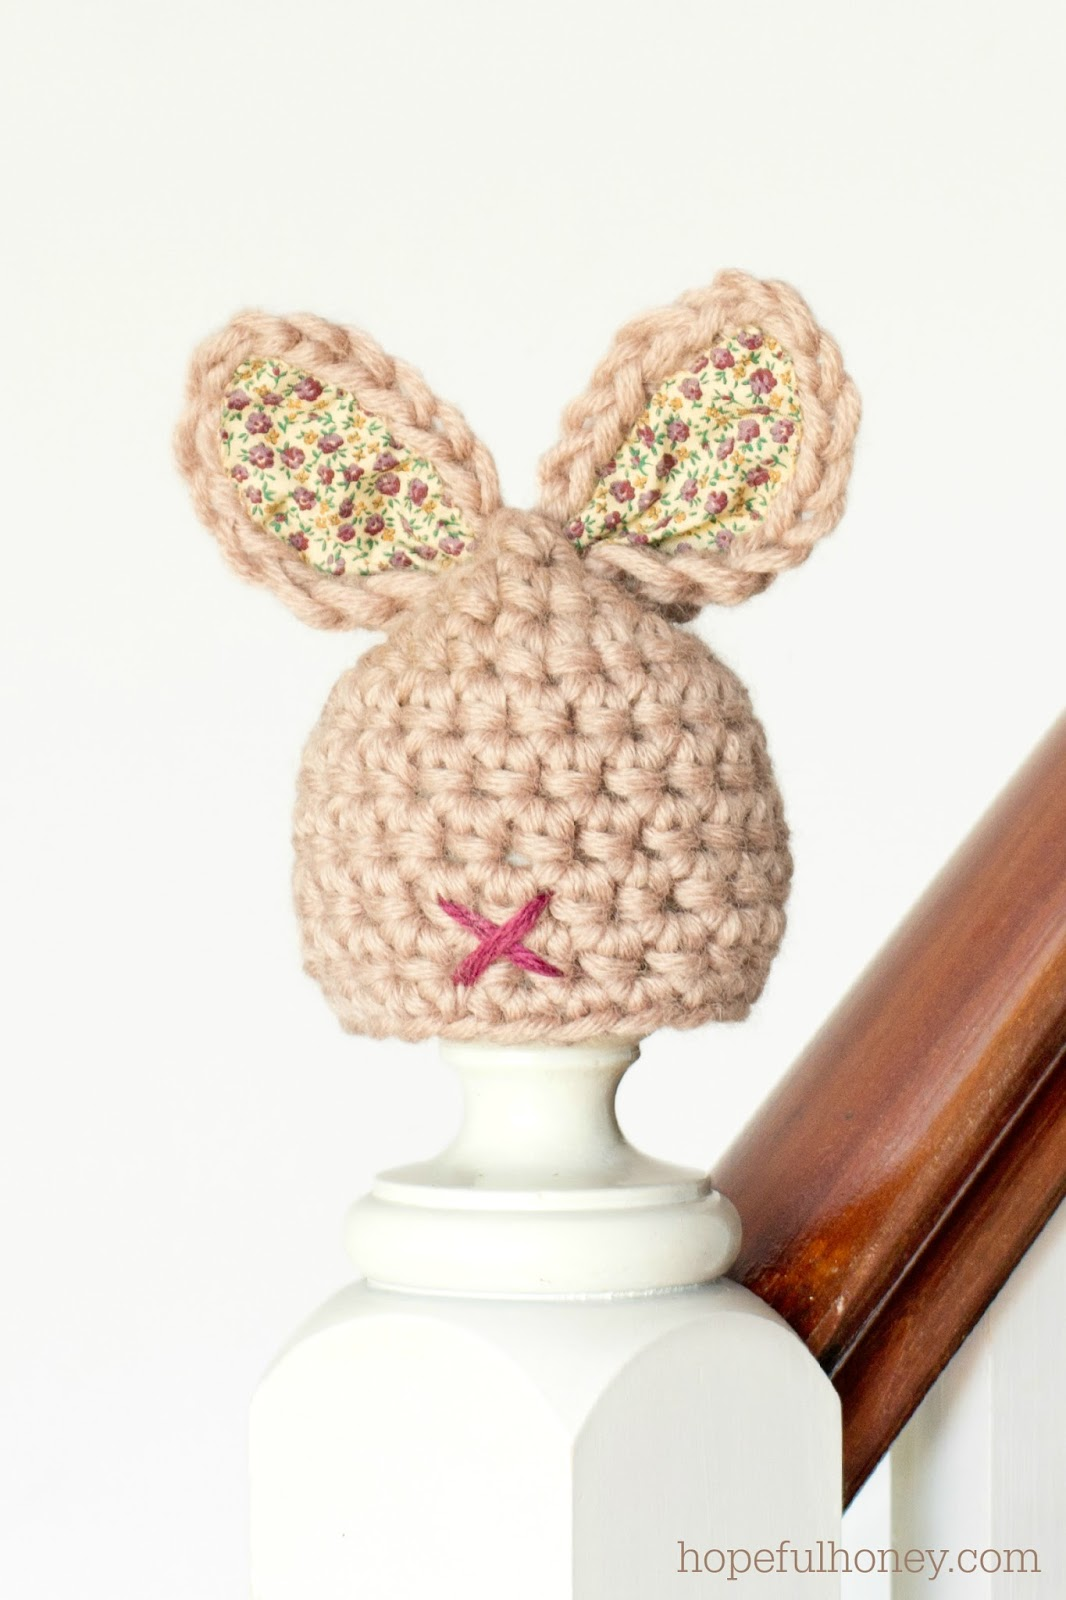 Crochet Pattern Bunny Hat : Hopeful Honey Craft, Crochet, Create: Newborn Bunny Hat ...